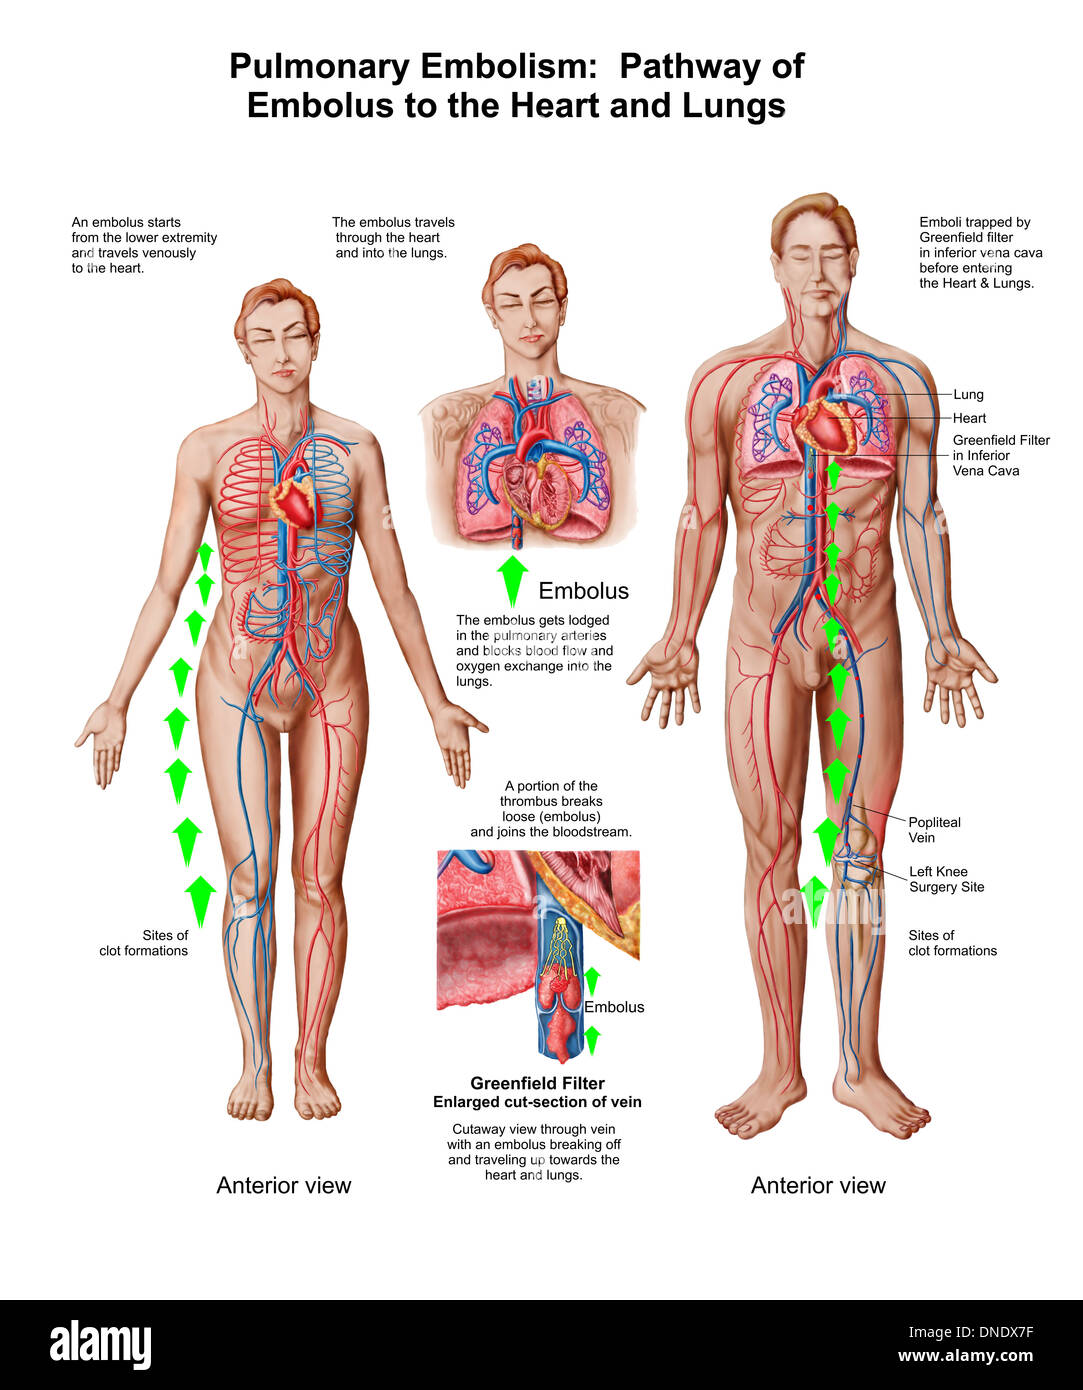 Male Chest Anatomy Heart Veins Stock Photos & Male Chest Anatomy ...